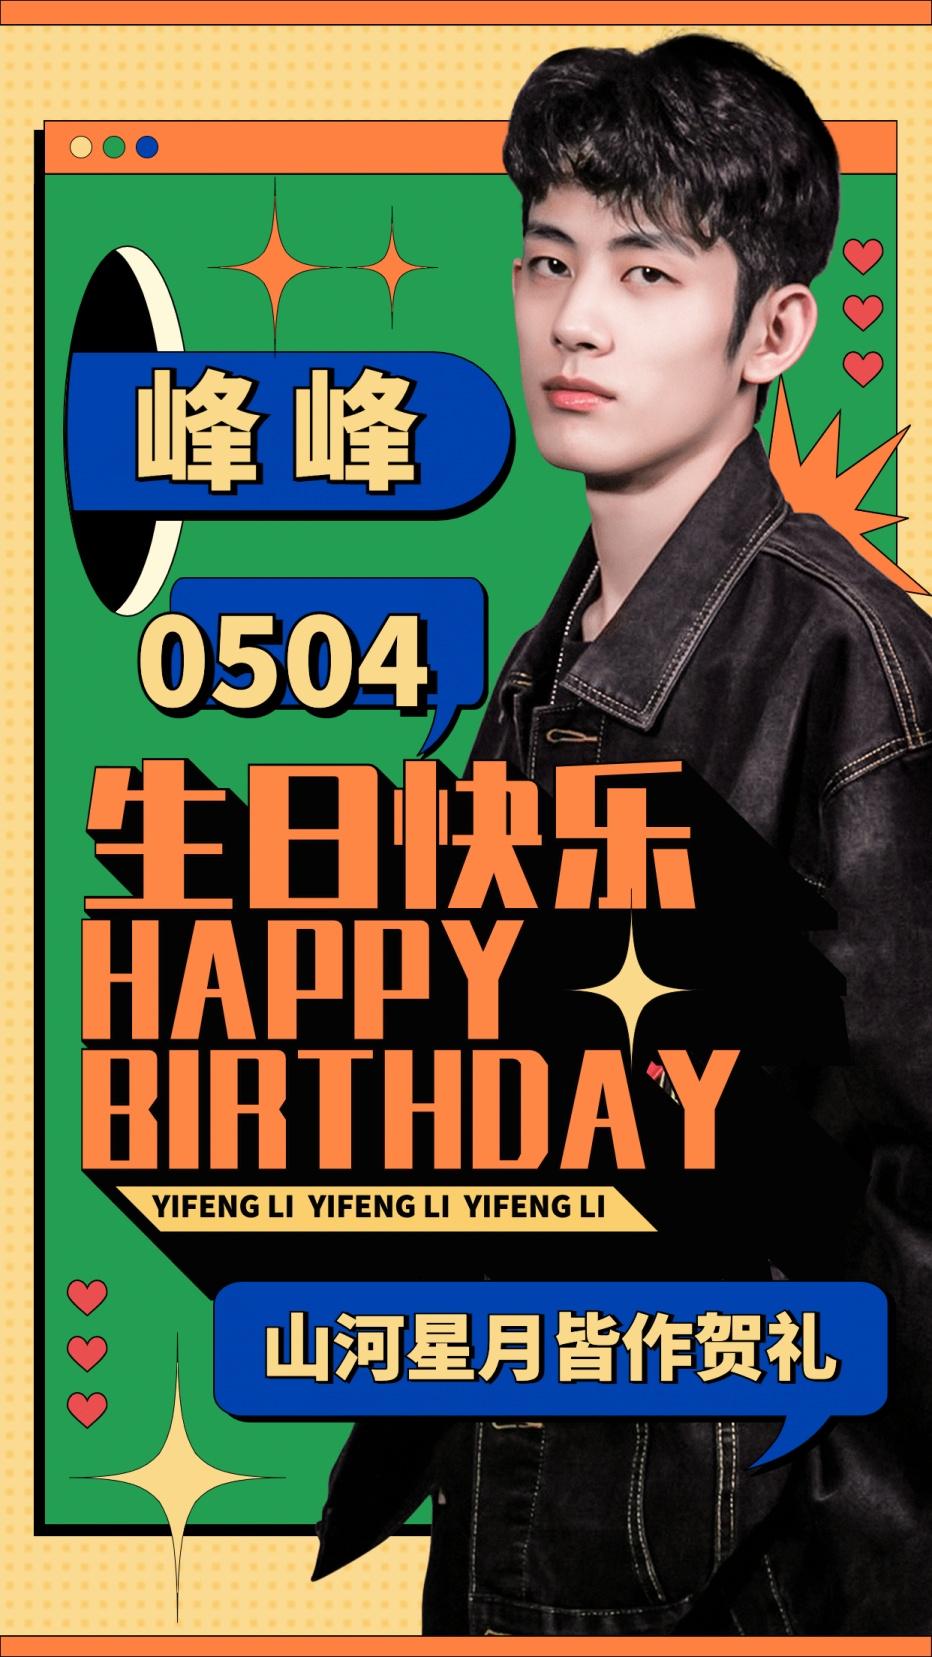 6W-生贺丰巢图应援人物海报-排版-标准